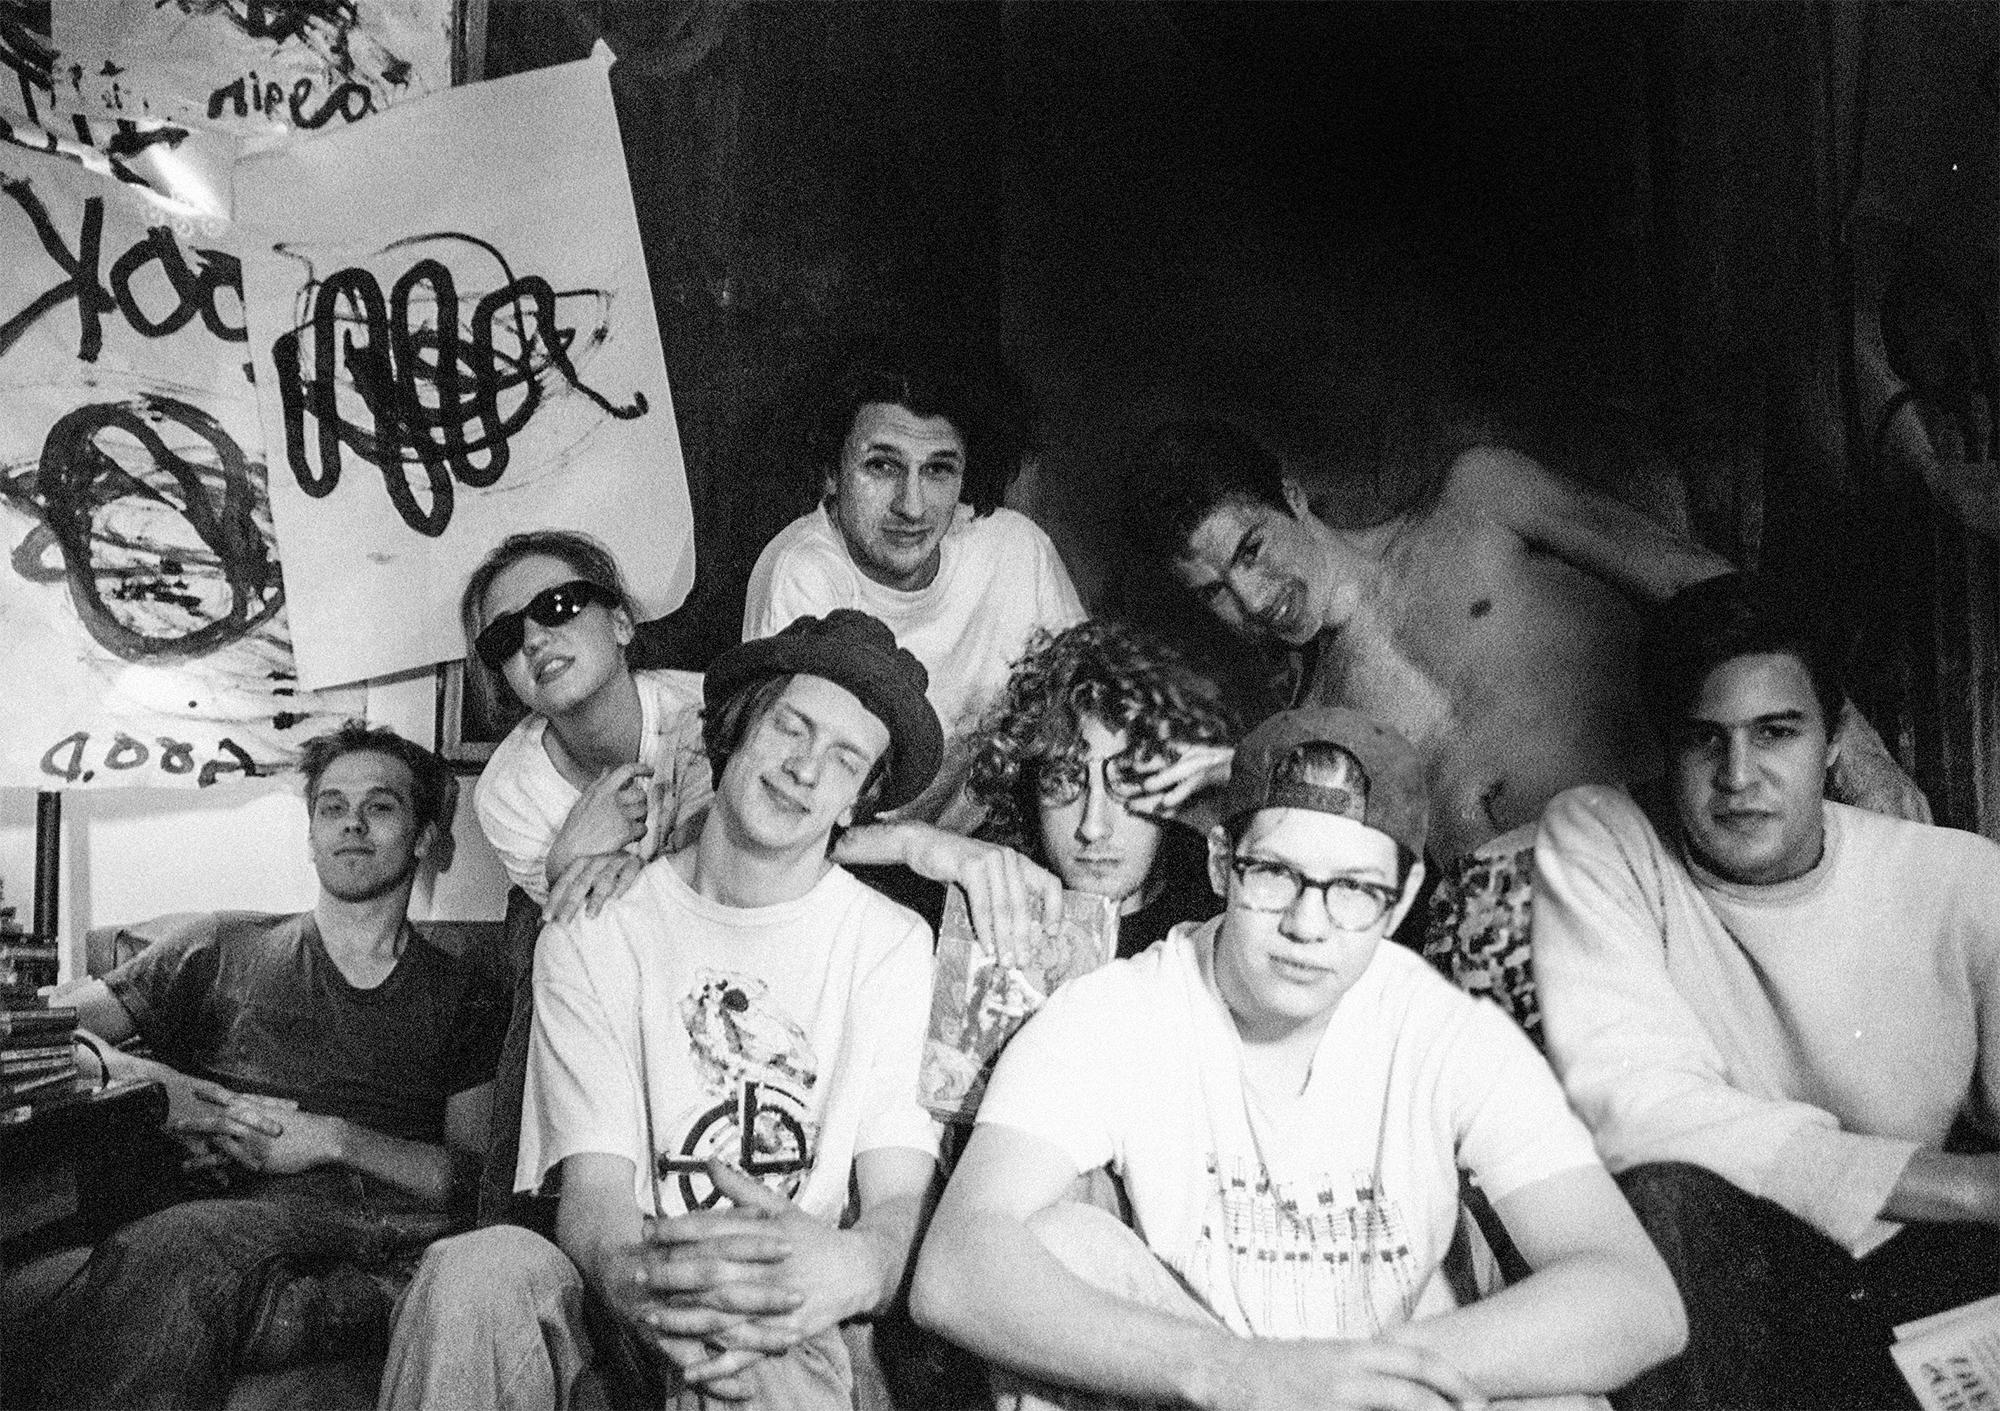 Rockie Brockway, Millie Benson, Neil Chastain, Chris Apanius, David McClelland, Joe McTighe, Ron Kretsch, Tarik Hussein (from left)